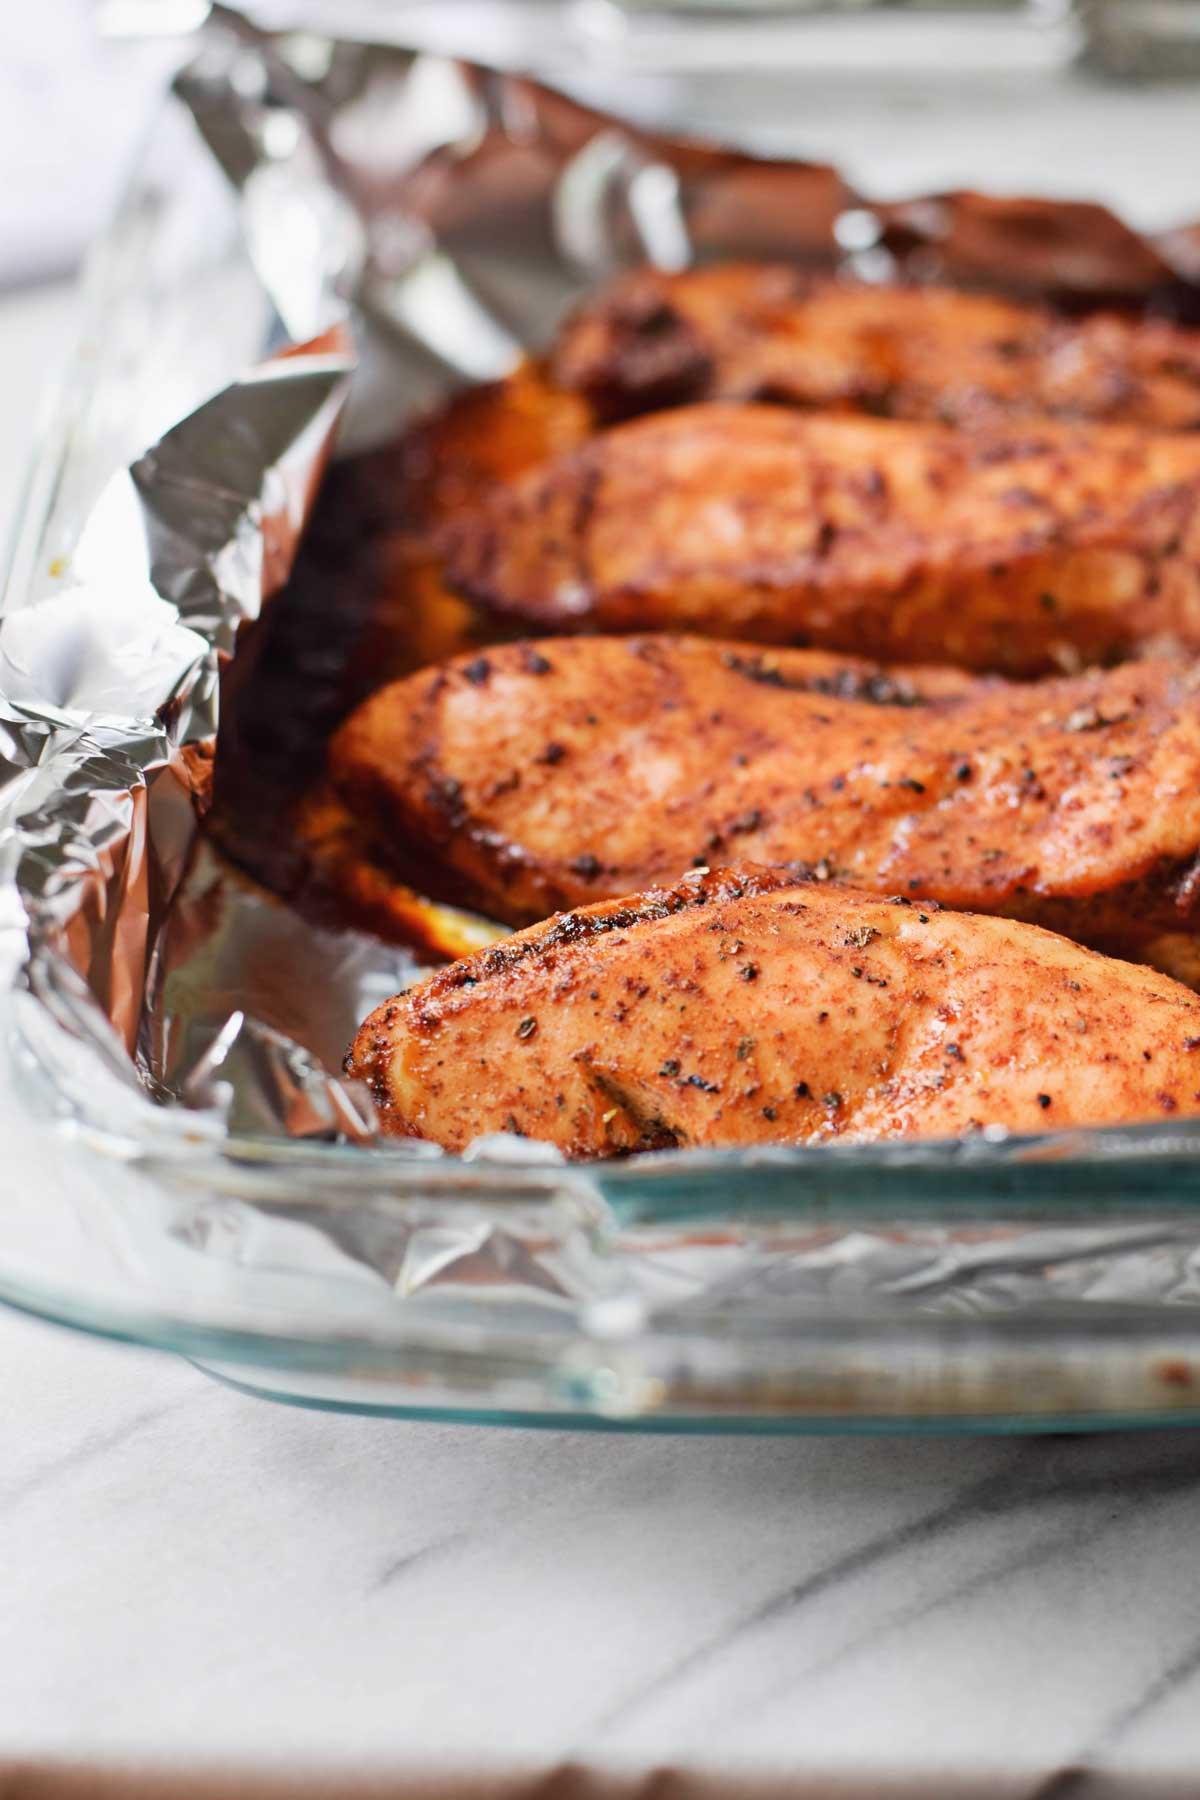 Oven Baked Chicken Breast Recipes  boneless skinless chicken breast recipes baked in oven